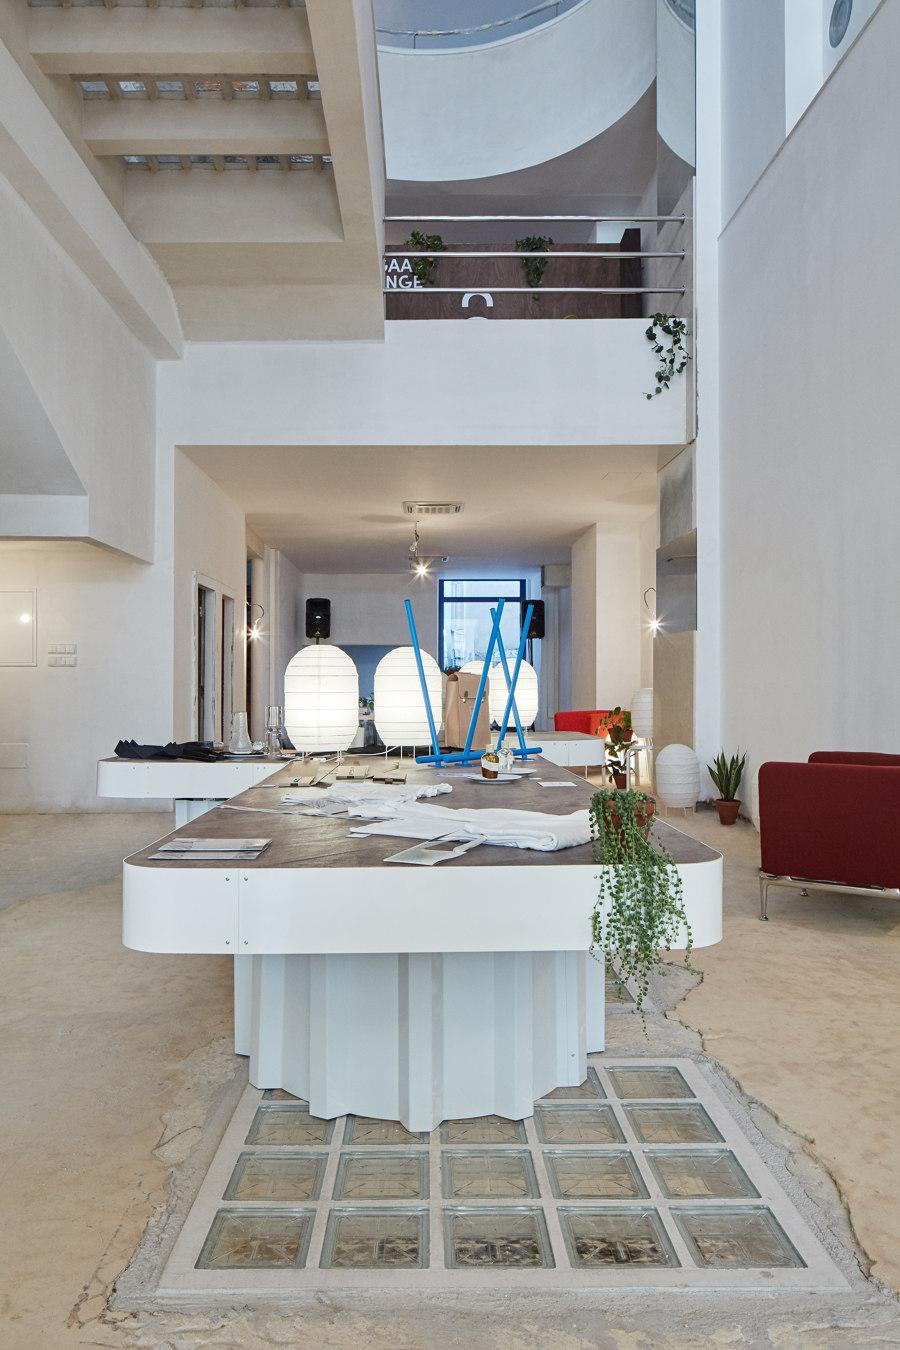 Kogaa Studio Turns Iconic Brno Functionalist Hotel Into Design Festival Venue by KOGAA Studio | Temporary structures